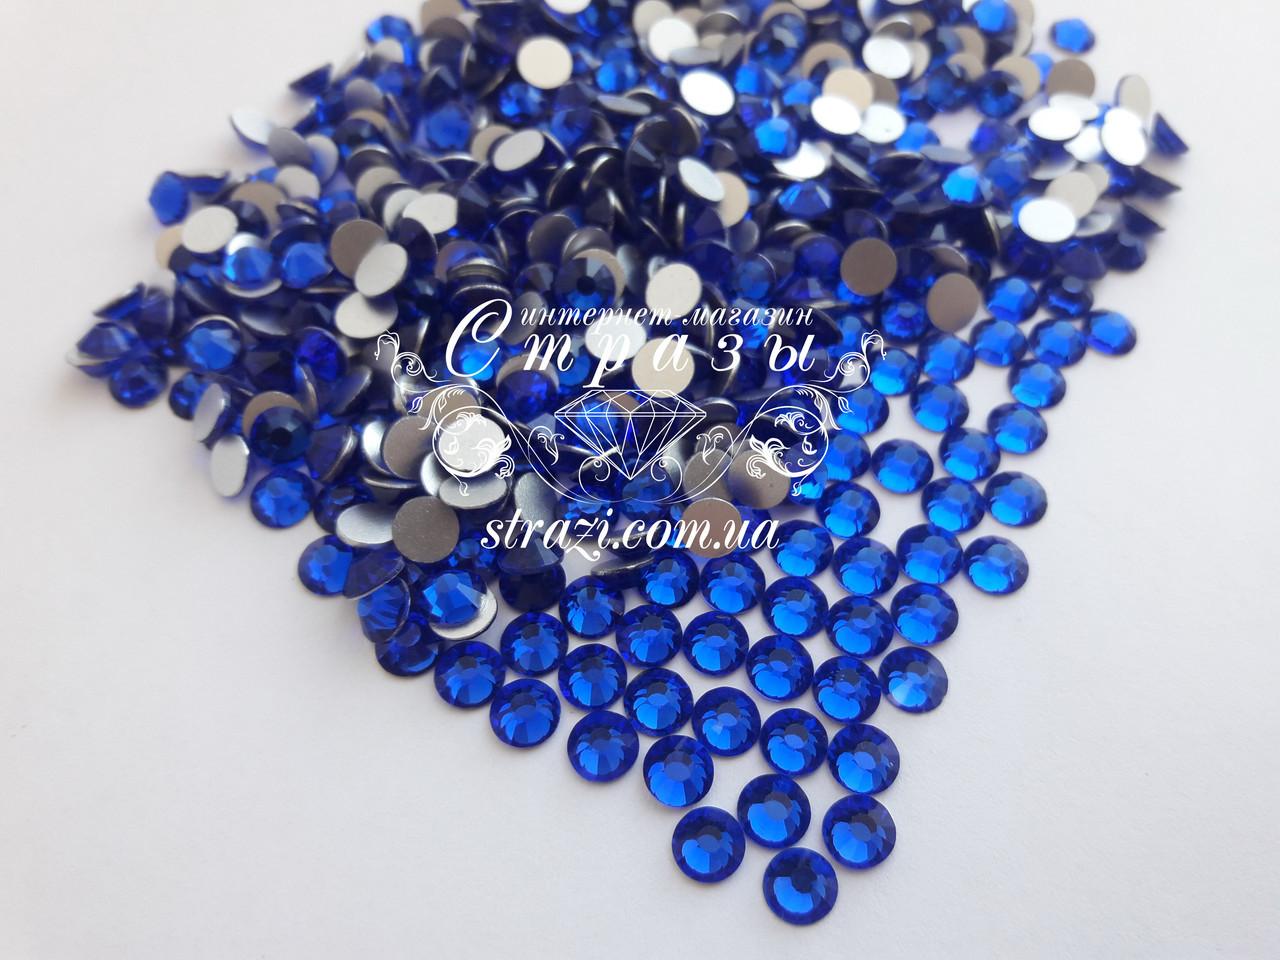 Стразы ss20 Sapphire, 100шт. (4,6-4,8мм)